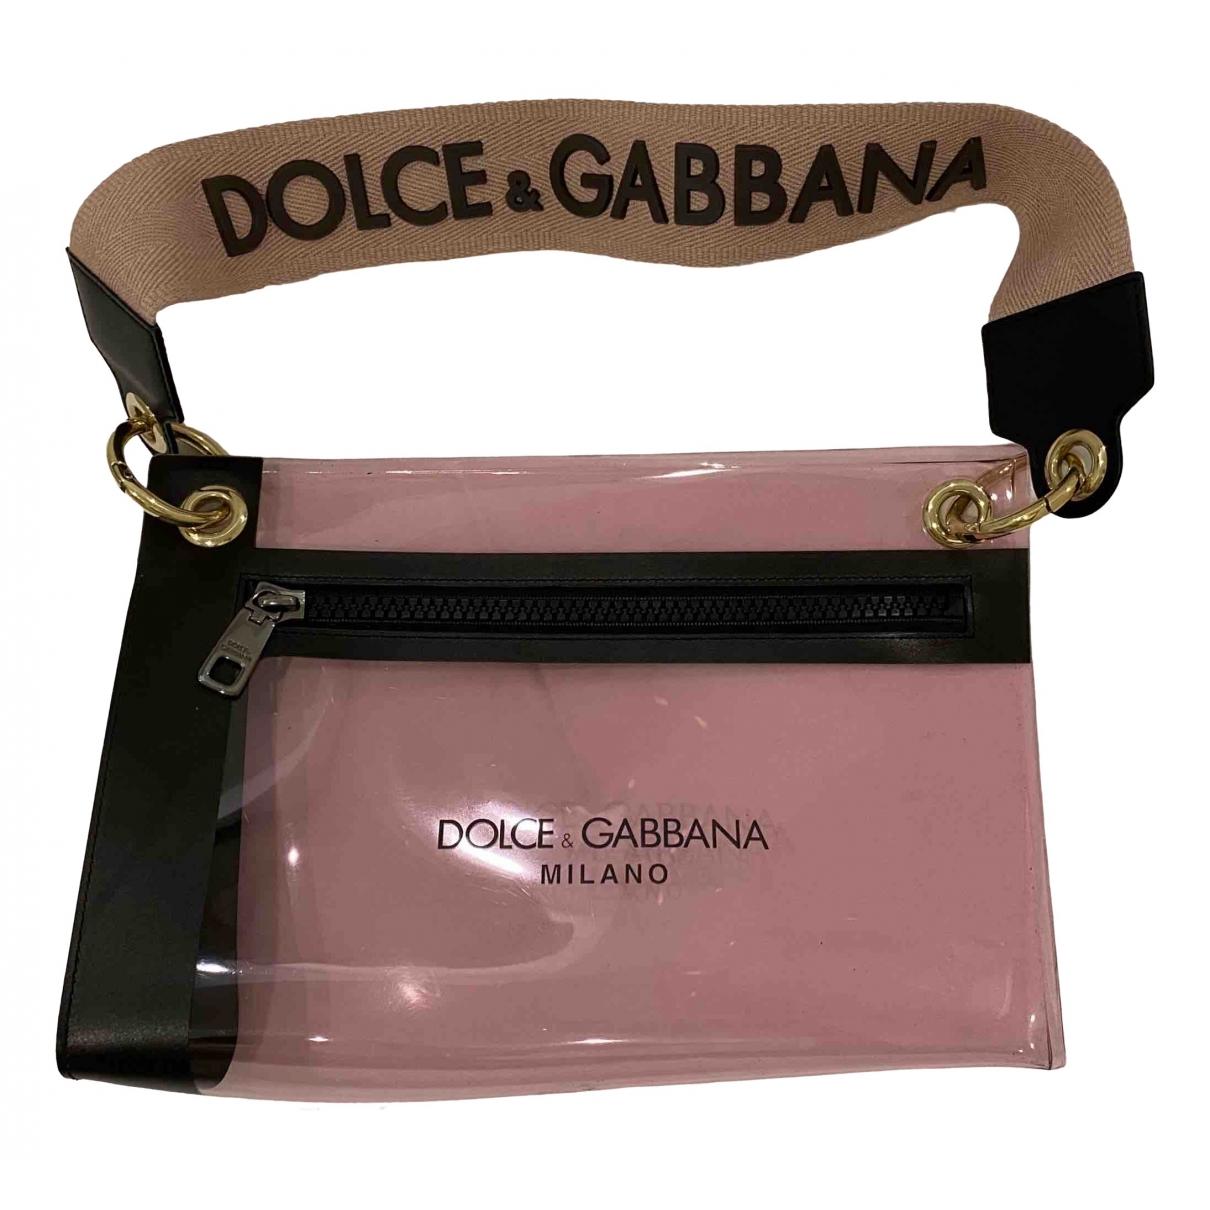 Dolce & Gabbana \N Pink handbag for Women \N